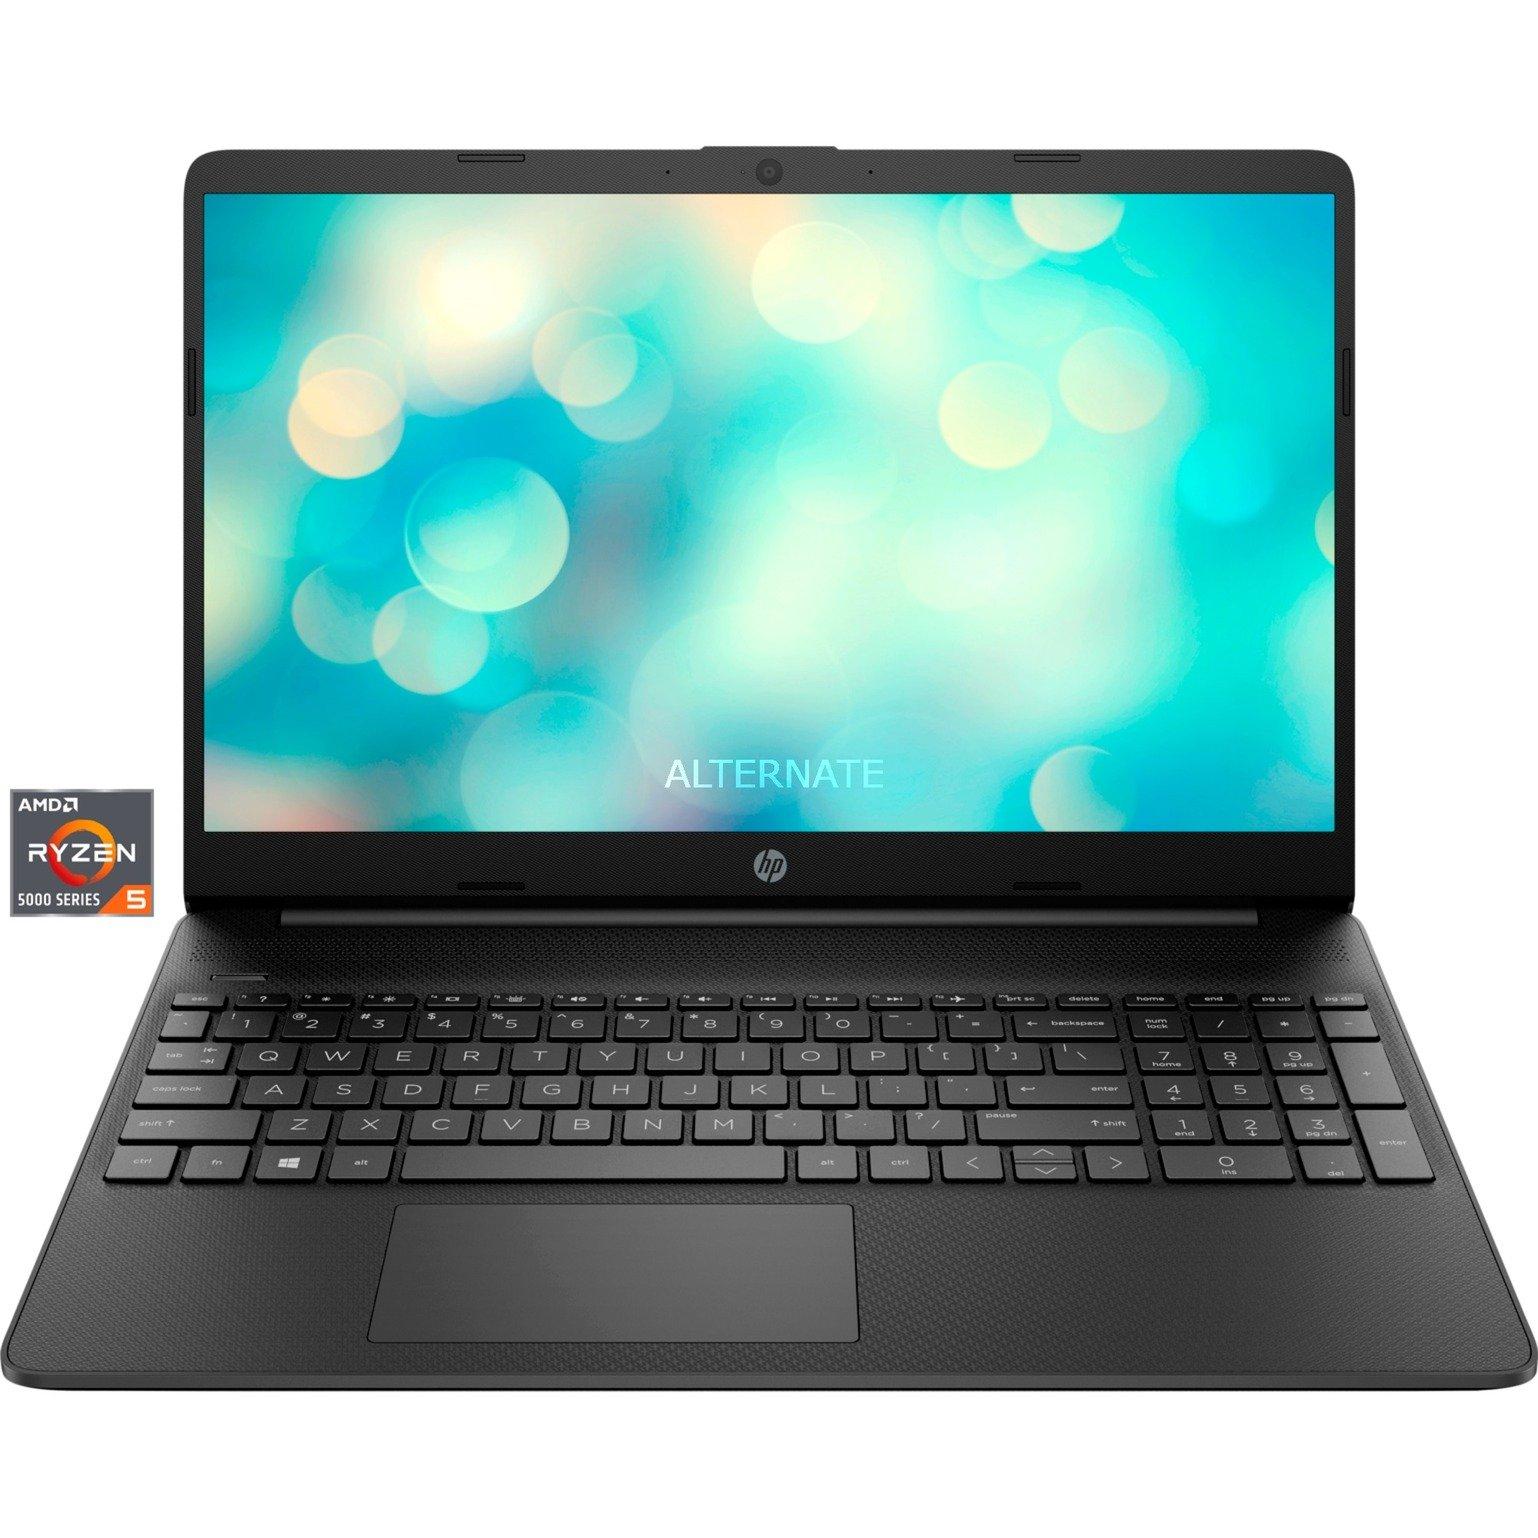 "HP 15s-eq2152ng Notebook 15,6"" IPS FHD, Ryzen 5500U 6C/12T, 8+256GB, 41 Wh, FreeDos[eff. 424€]"